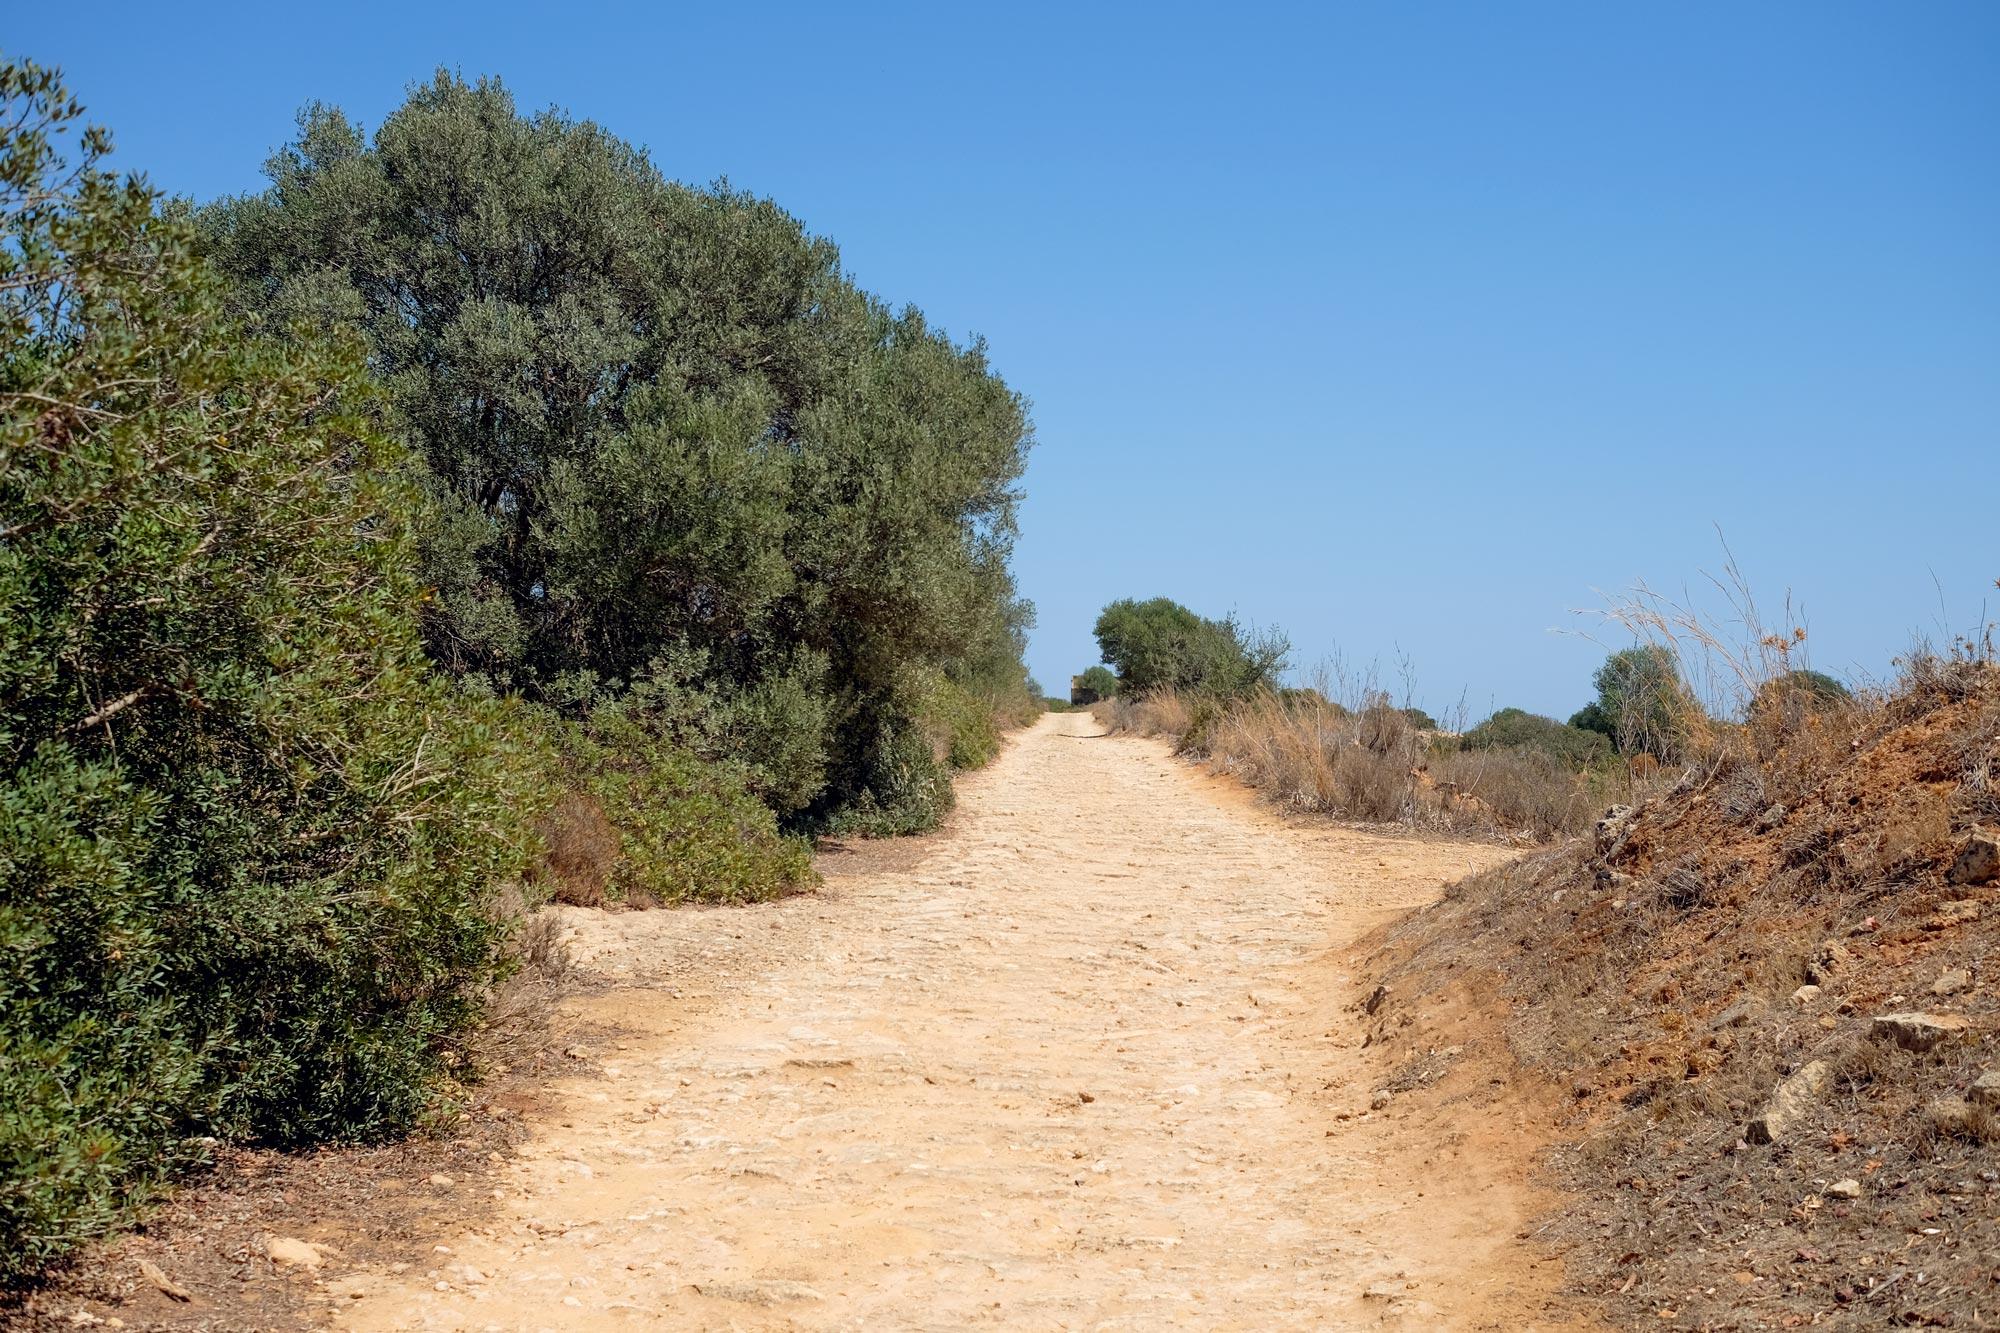 italia-sicilia-calamosche6